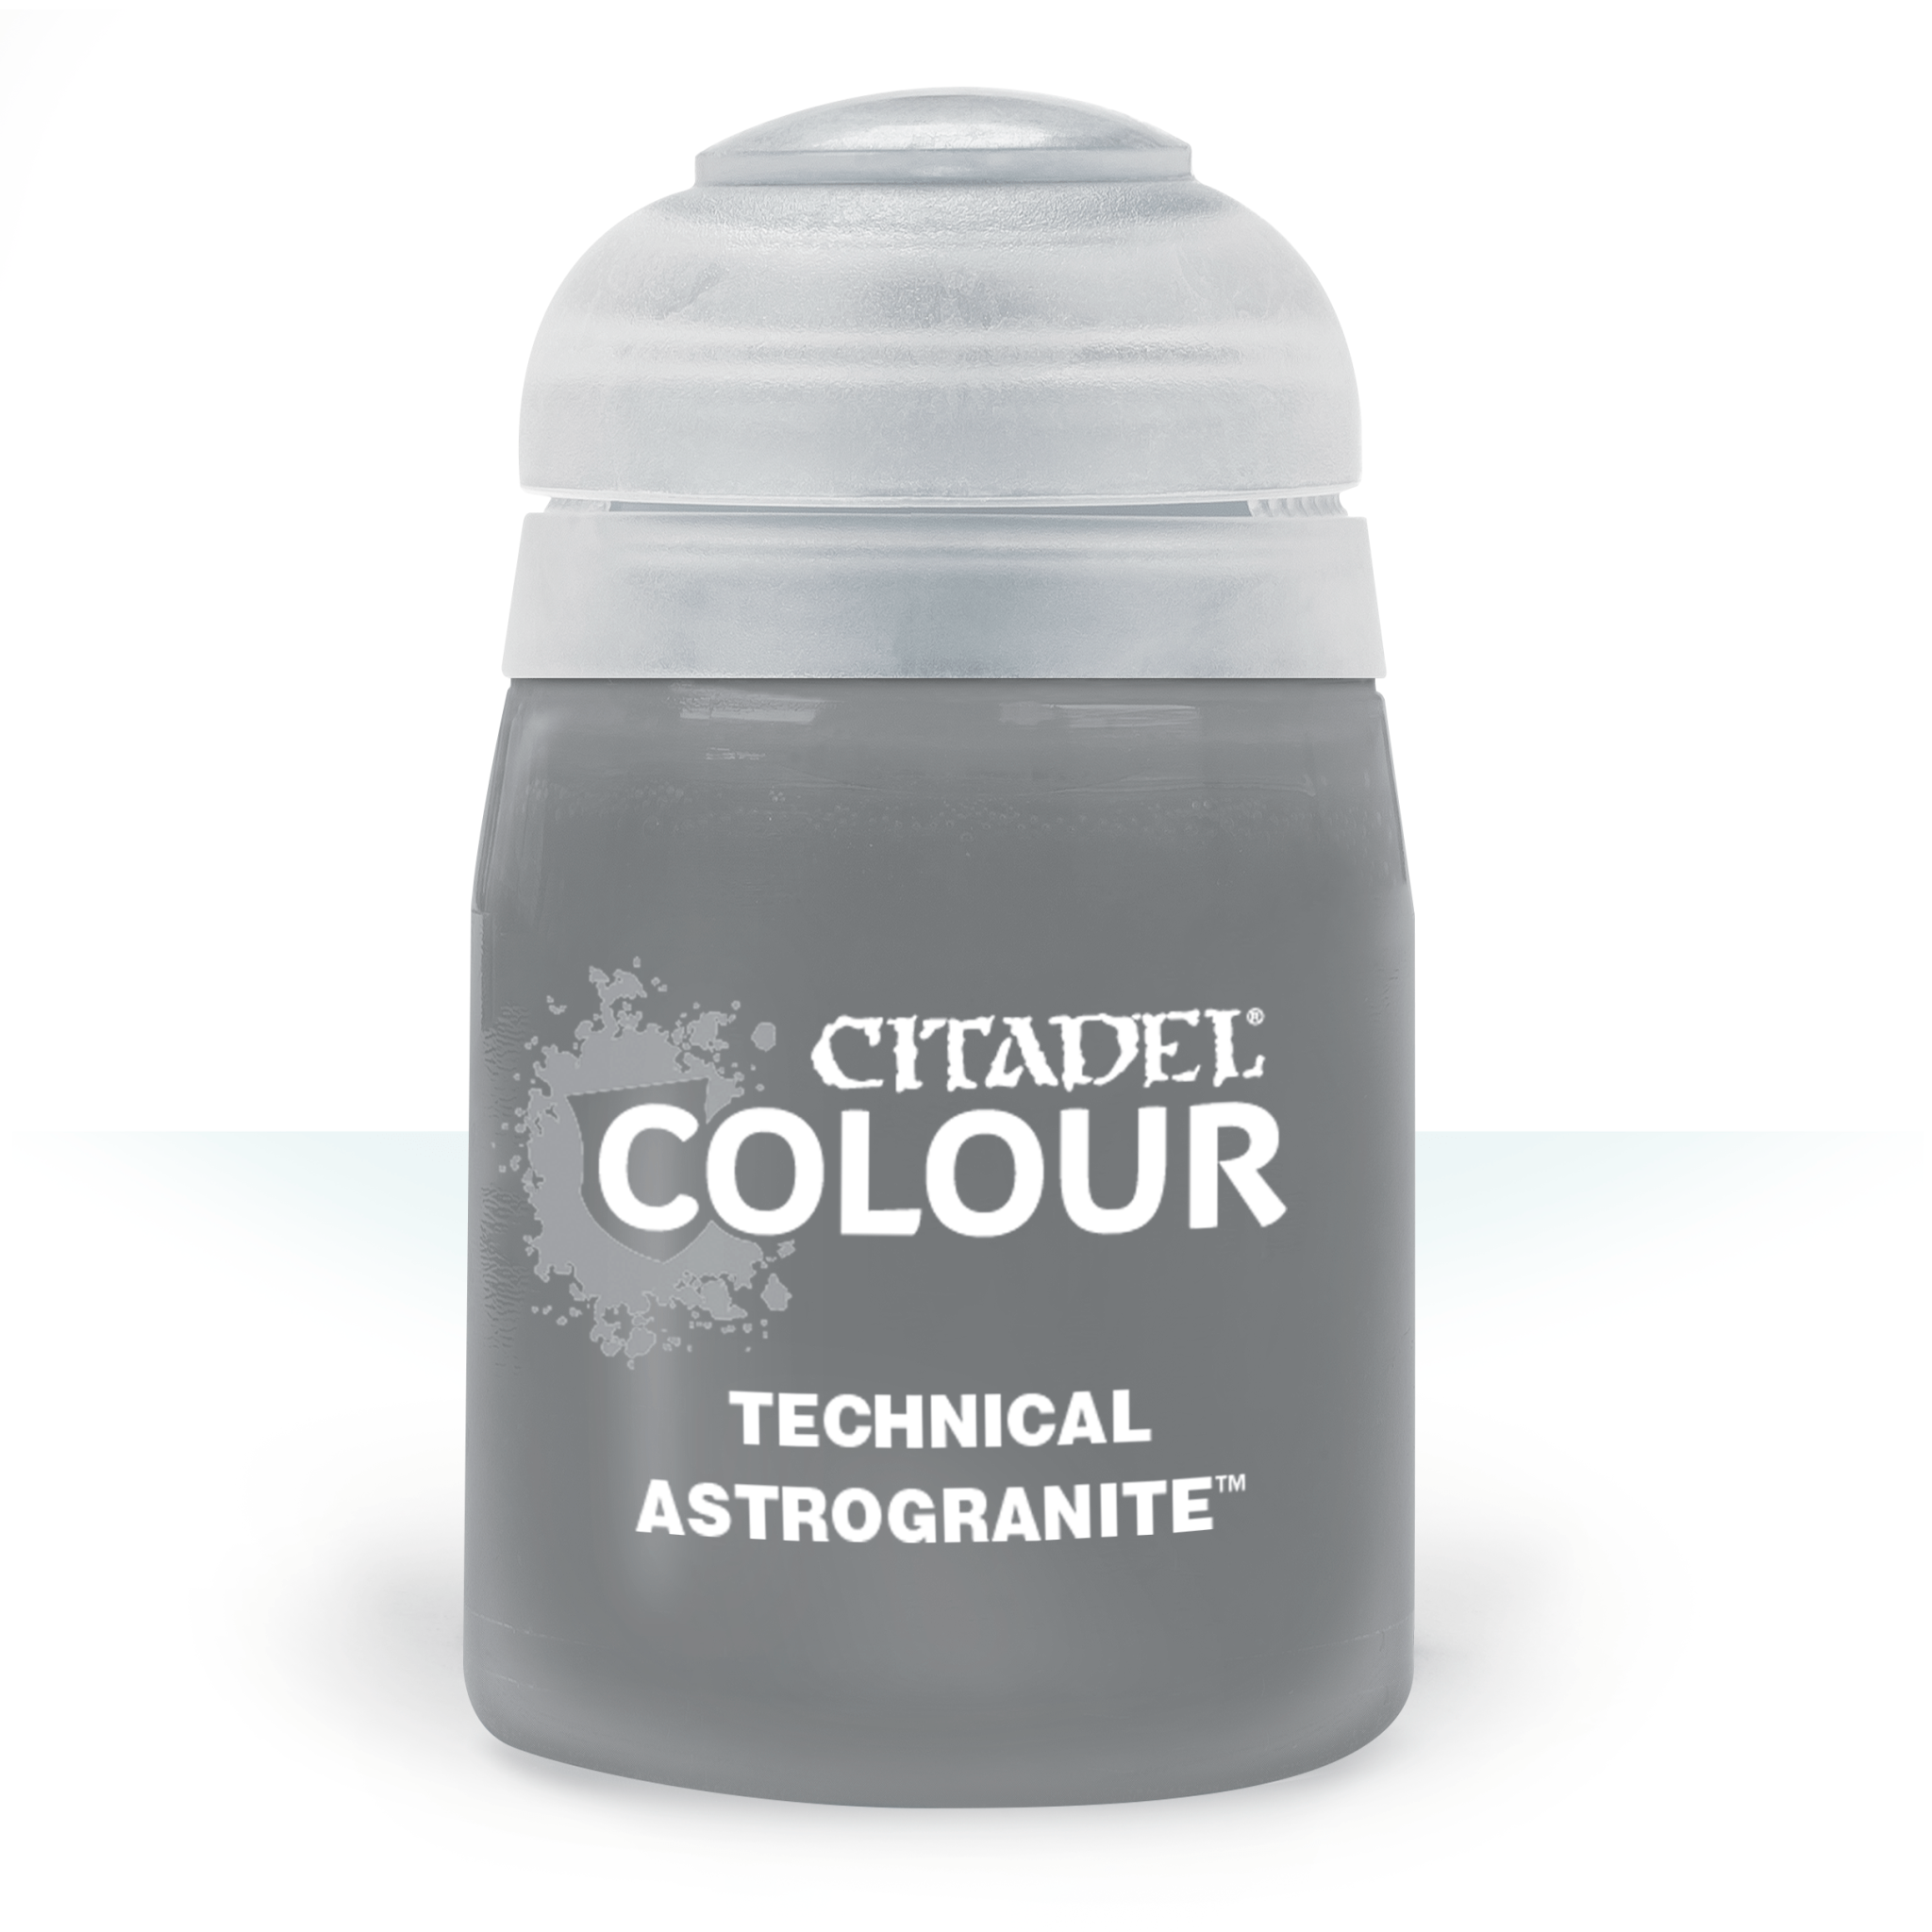 Astrogranite (Technical 24ml)